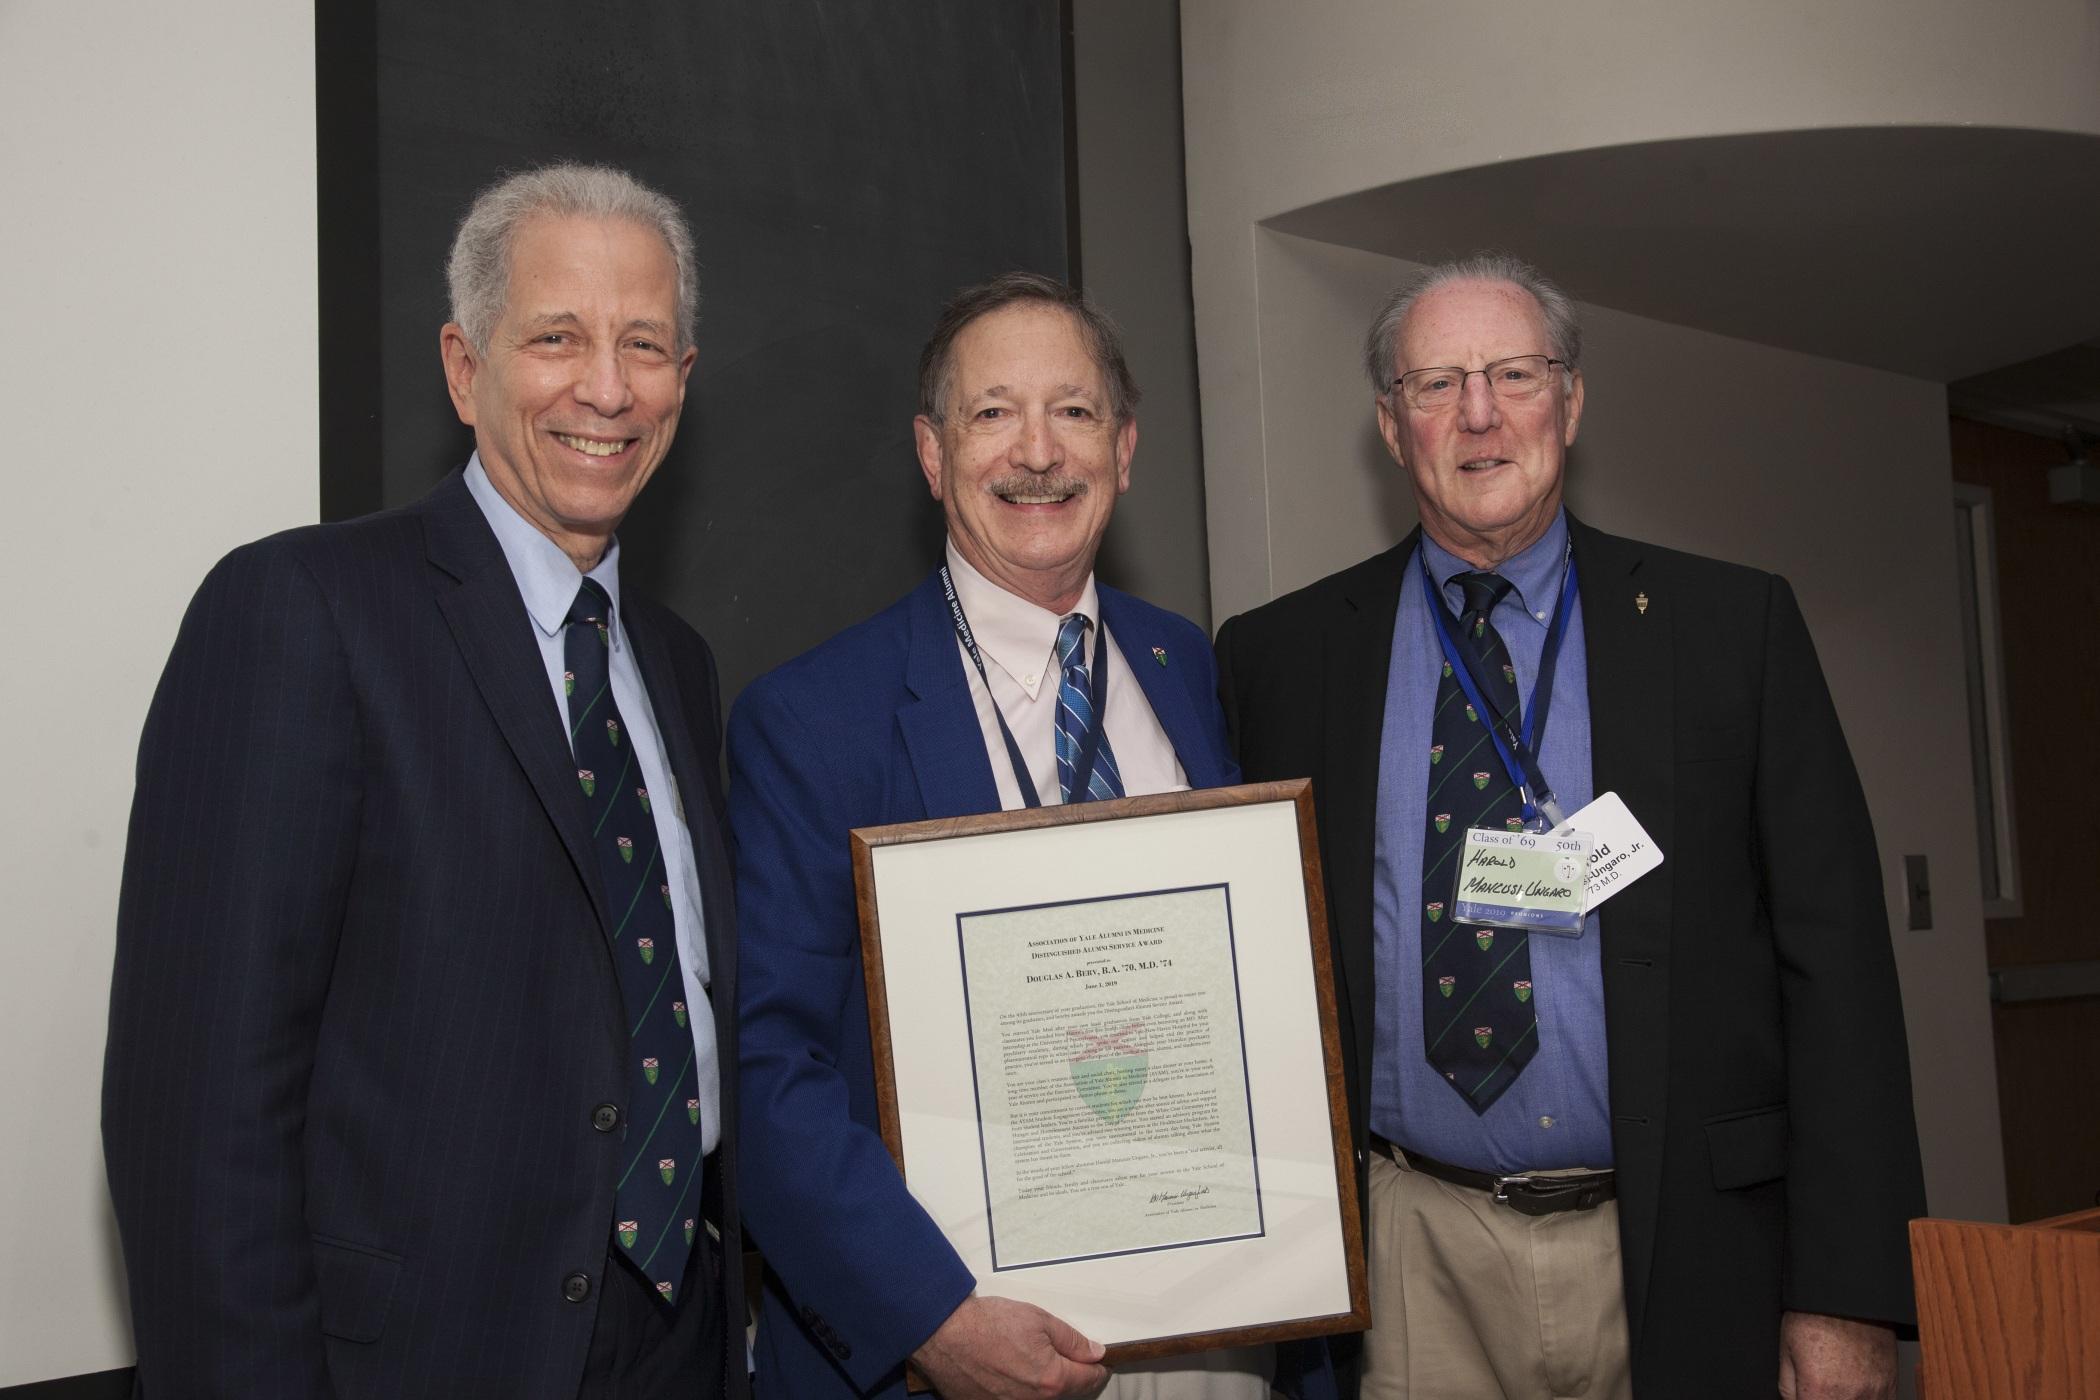 Douglas Berv, B.A. '70, M.D. '74, received the Distinguished Alumni Service Award from Dean Robert Alpern and AYAM President Harold Mancusi-Ungaro, M.D. '73